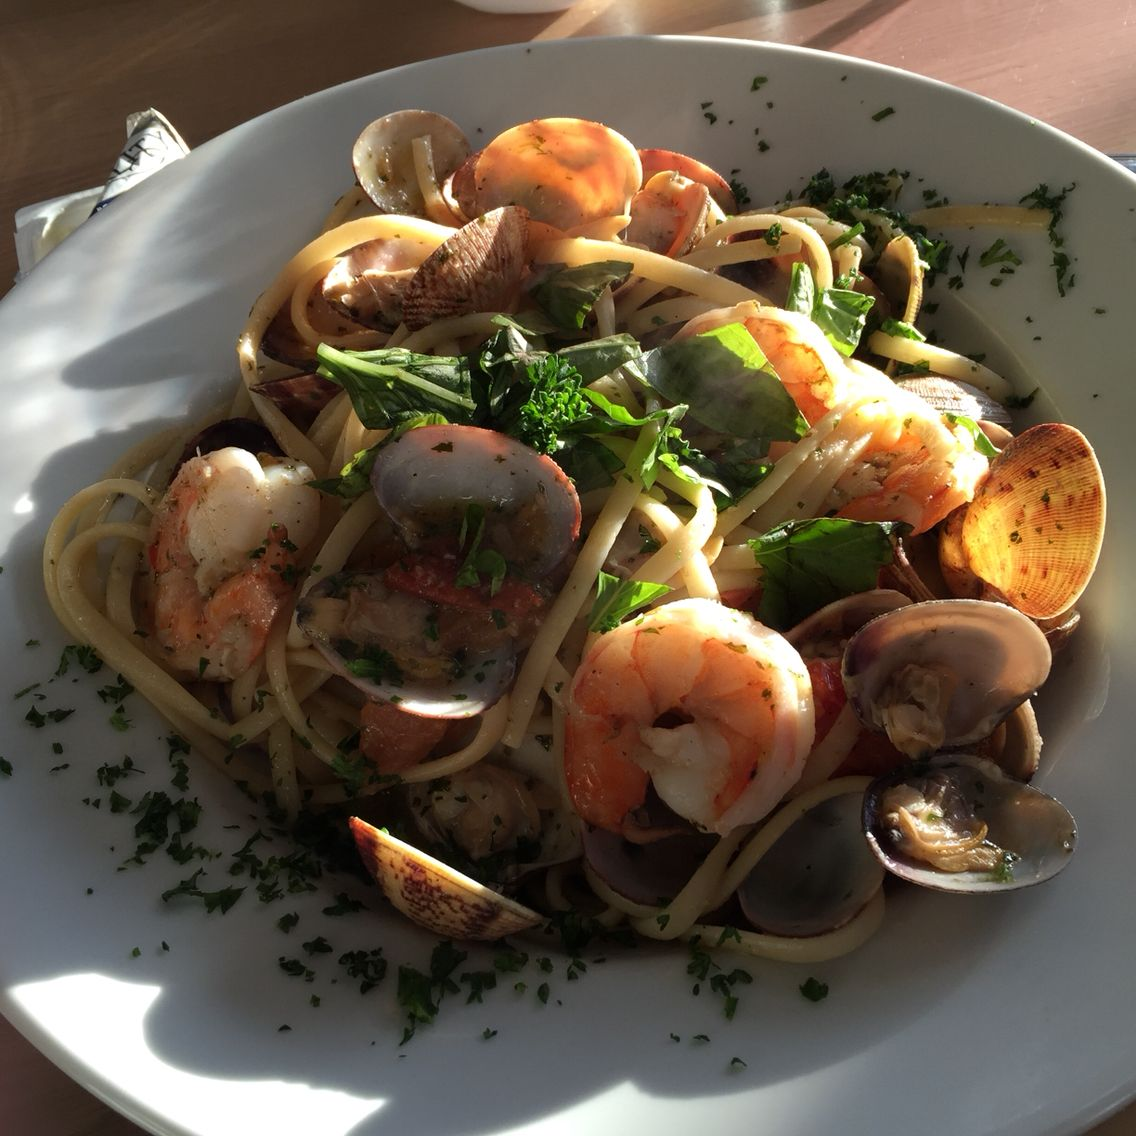 Linguini met vongole, scampi's, tomaat en basilicum